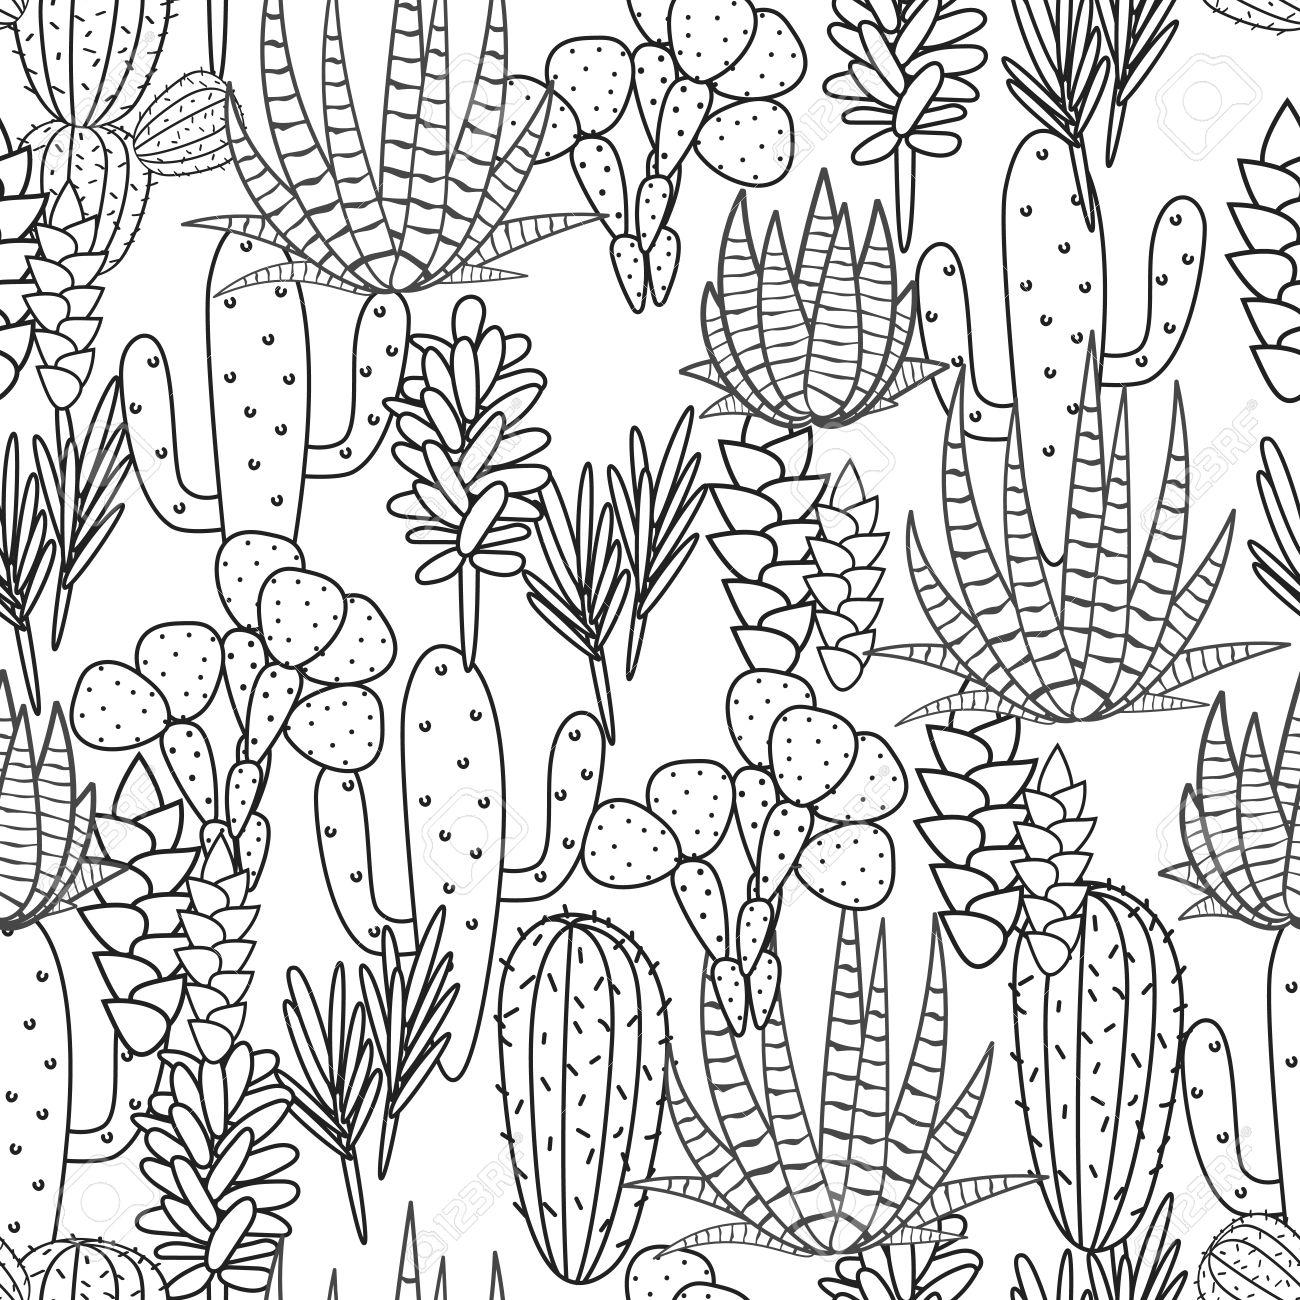 1300x1300 Succulents Cacti Plant Vector Seamless Pattern. Botanical Black